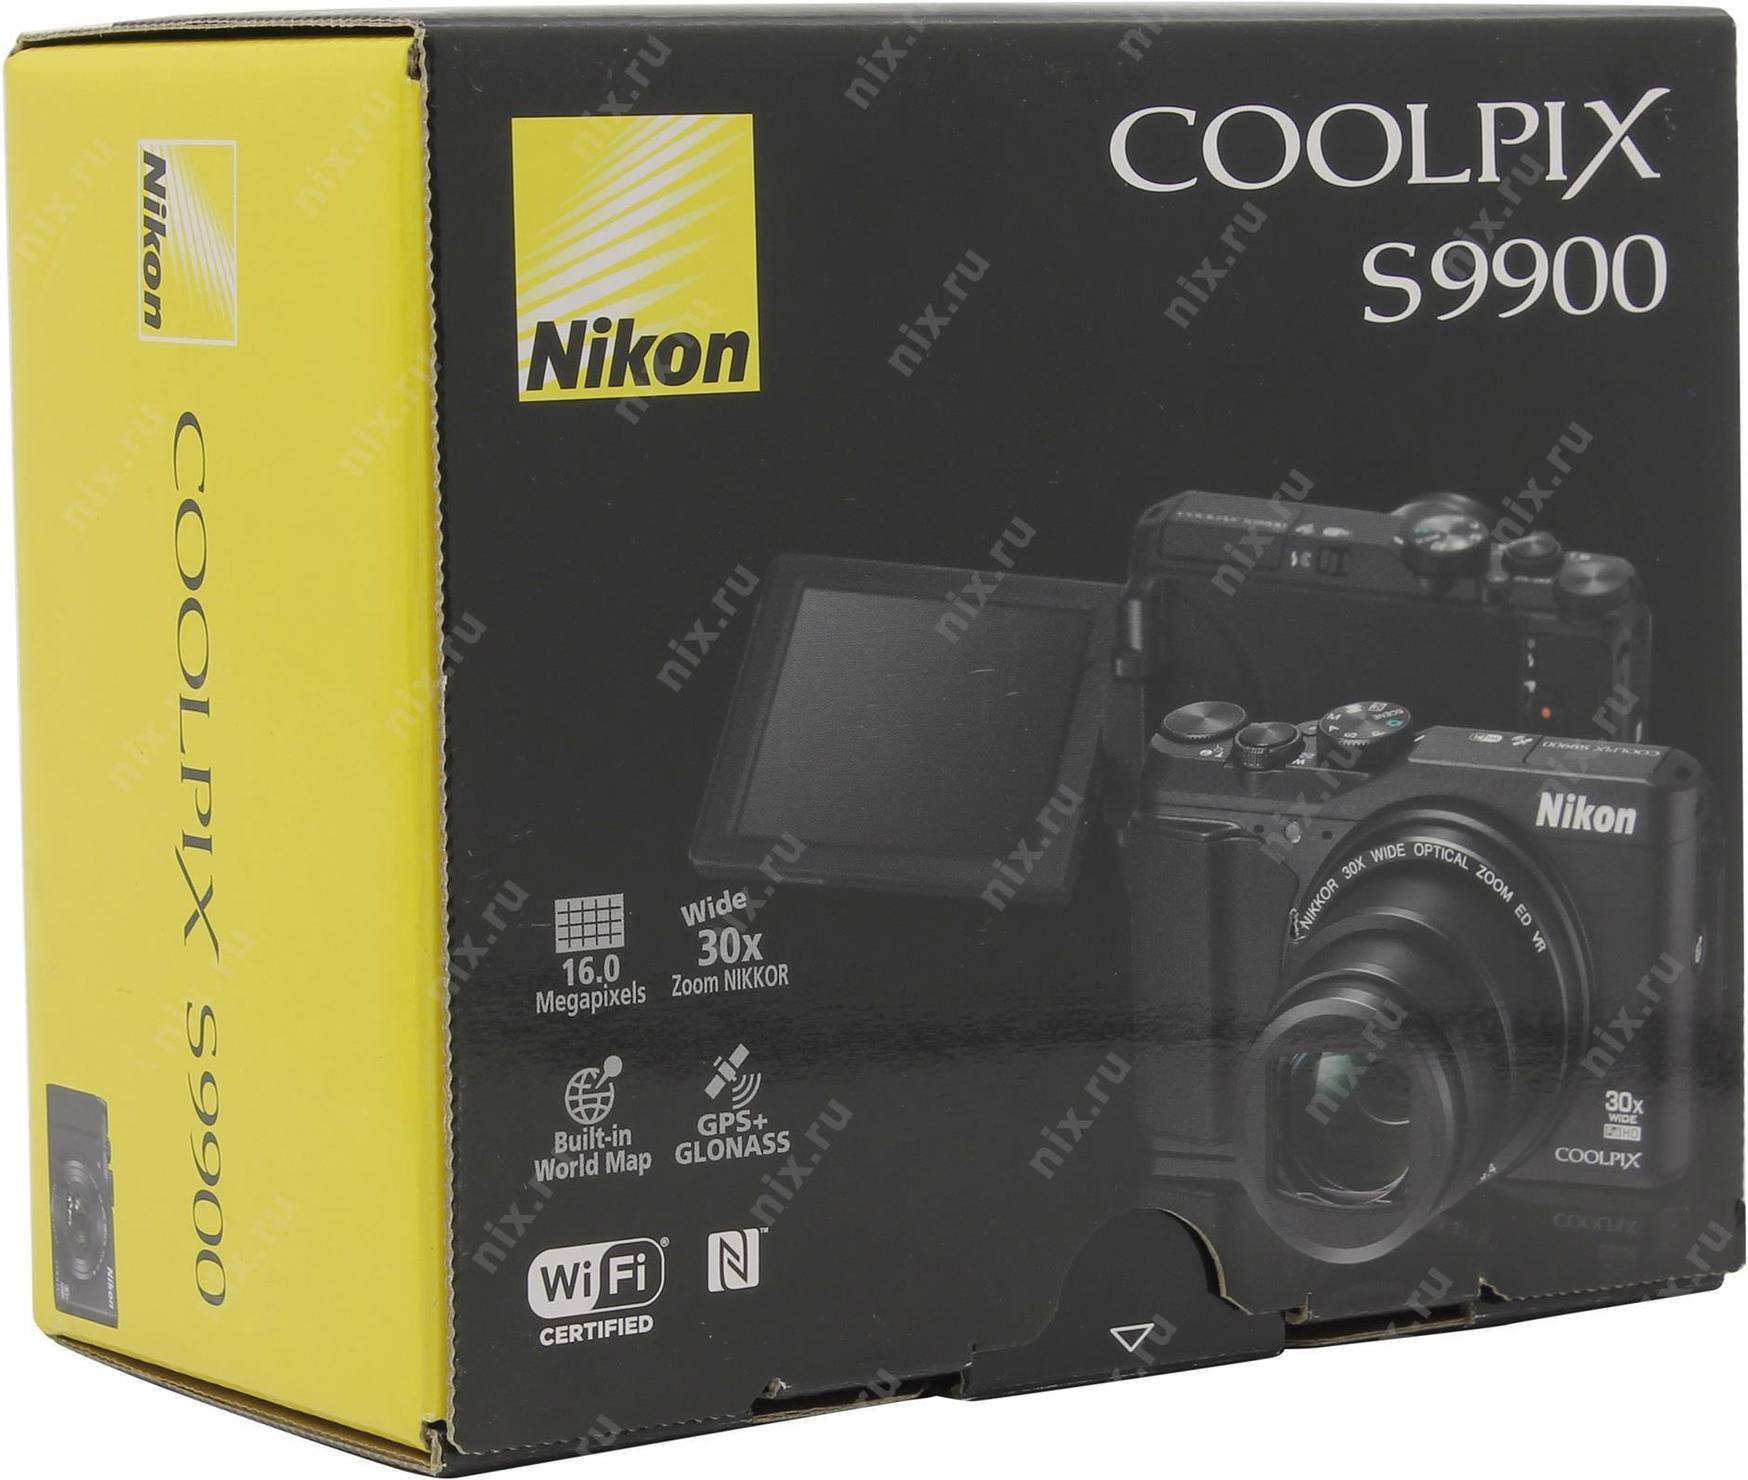 CoolPix S9900